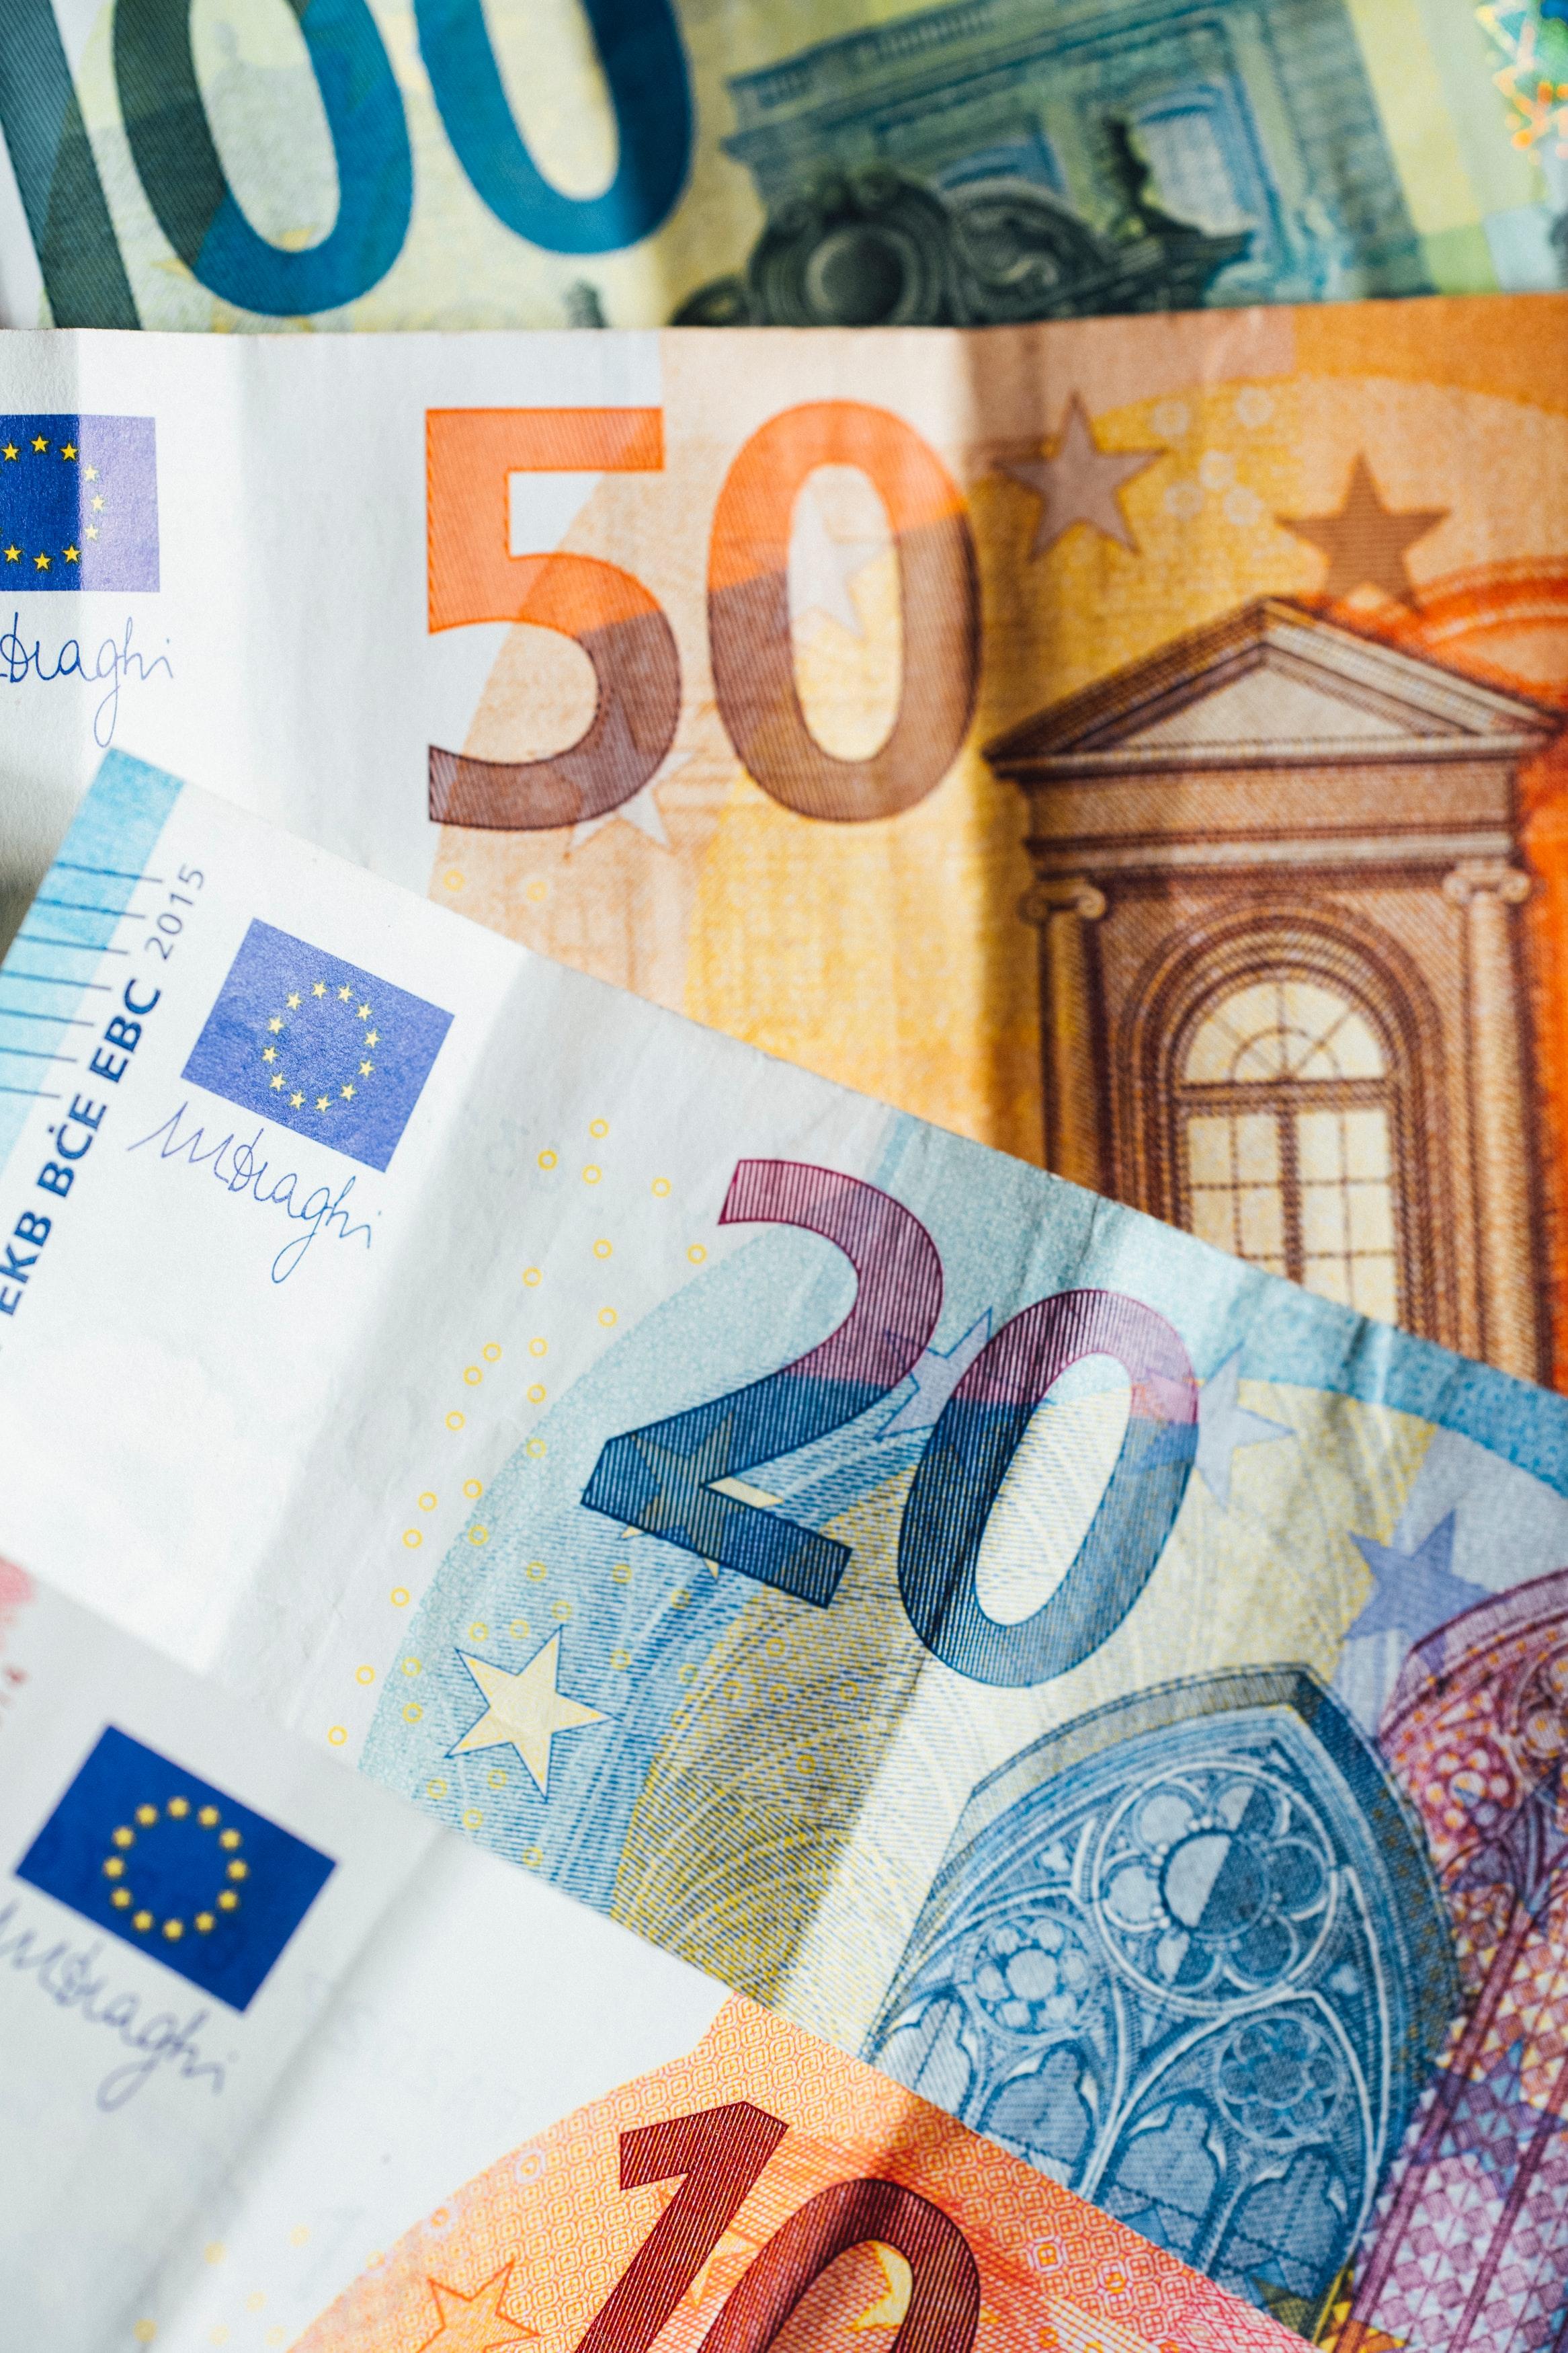 Geld - Geldstrafe- Strafbefehl